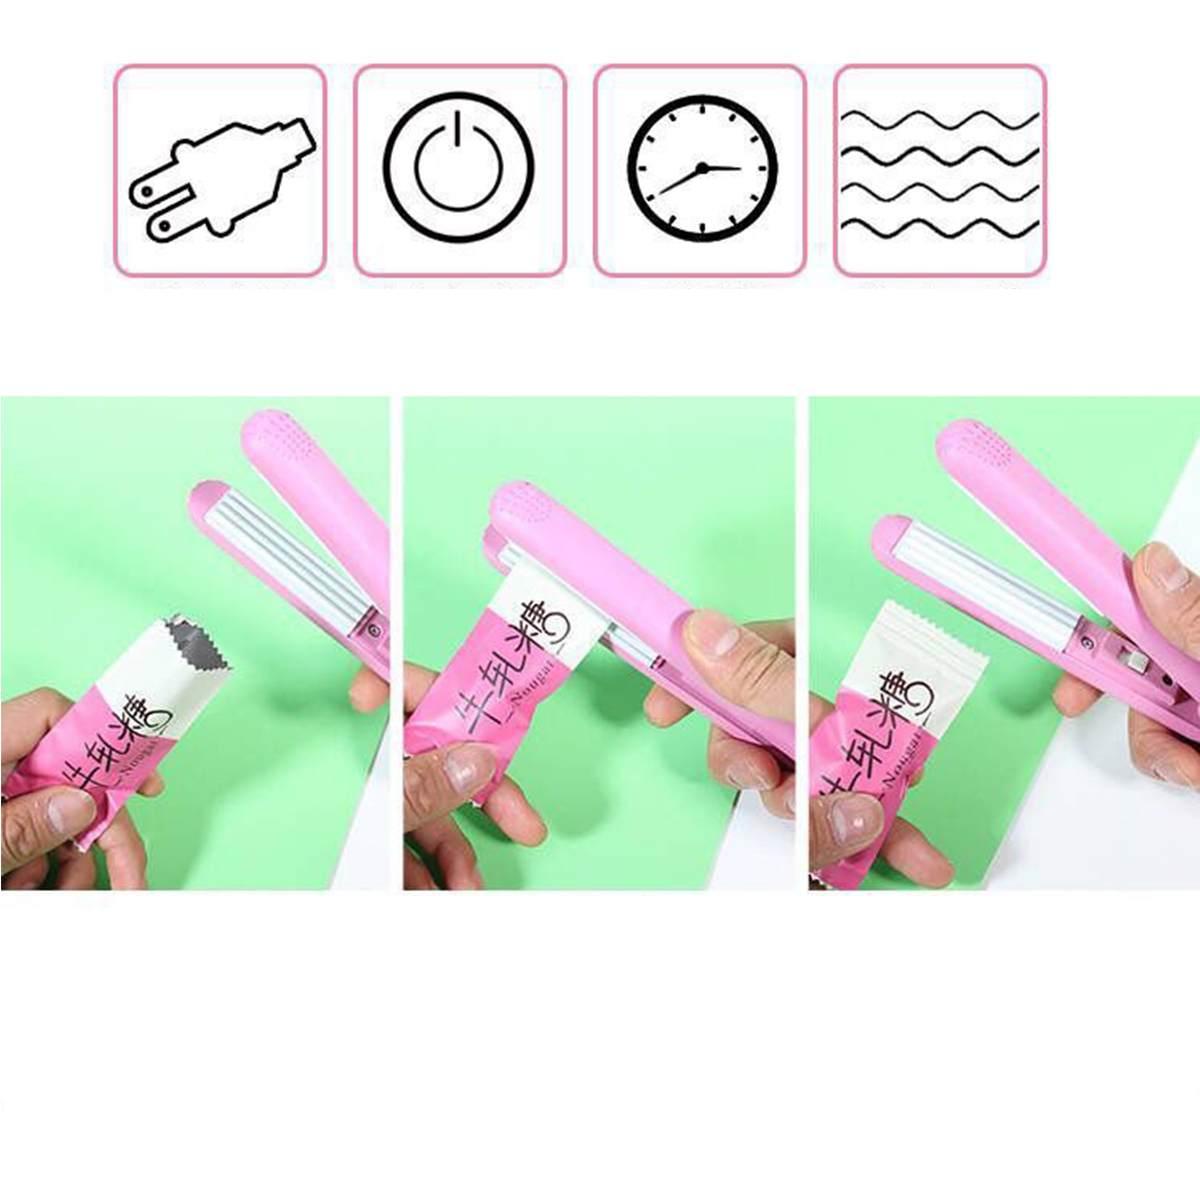 Home Vacuum Food Sealers Household Hand Press Mini Portable Nougat Bags Candy Bag Plastic Sealing Machine Snack Bag DIY Kit